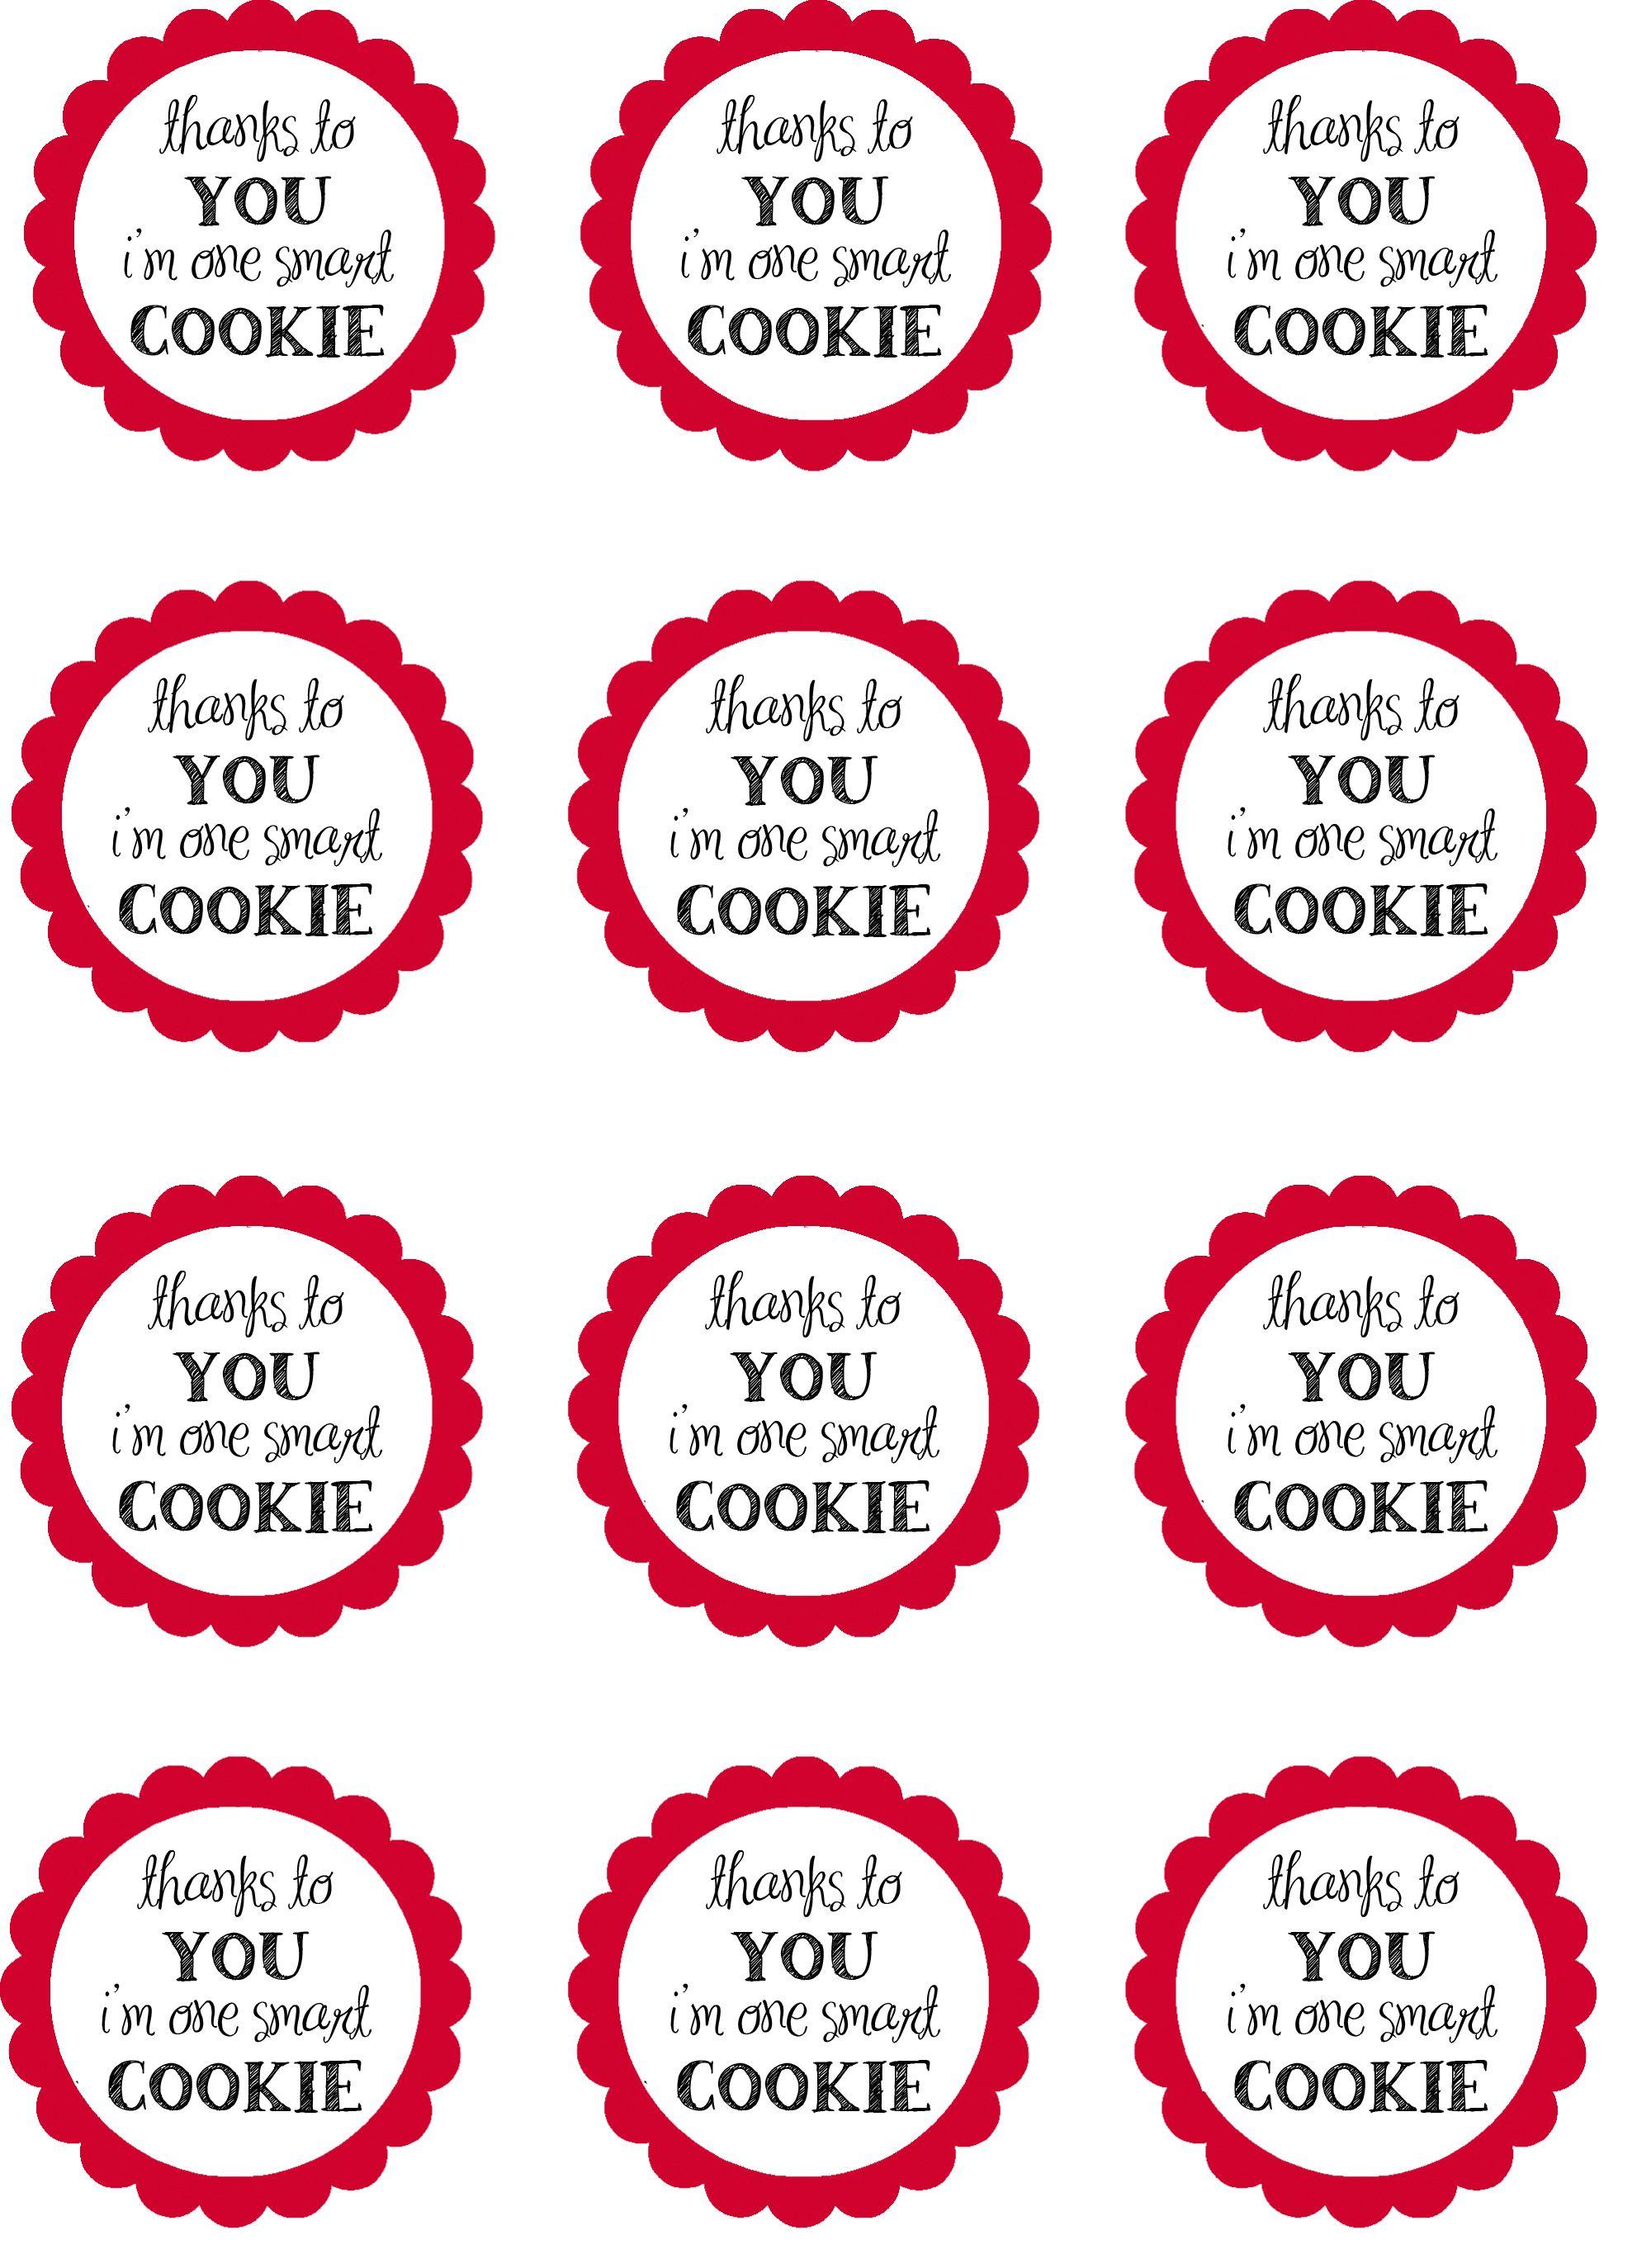 photo regarding One Smart Cookie Printable named sensible cookie printables Instructor appreciation presents